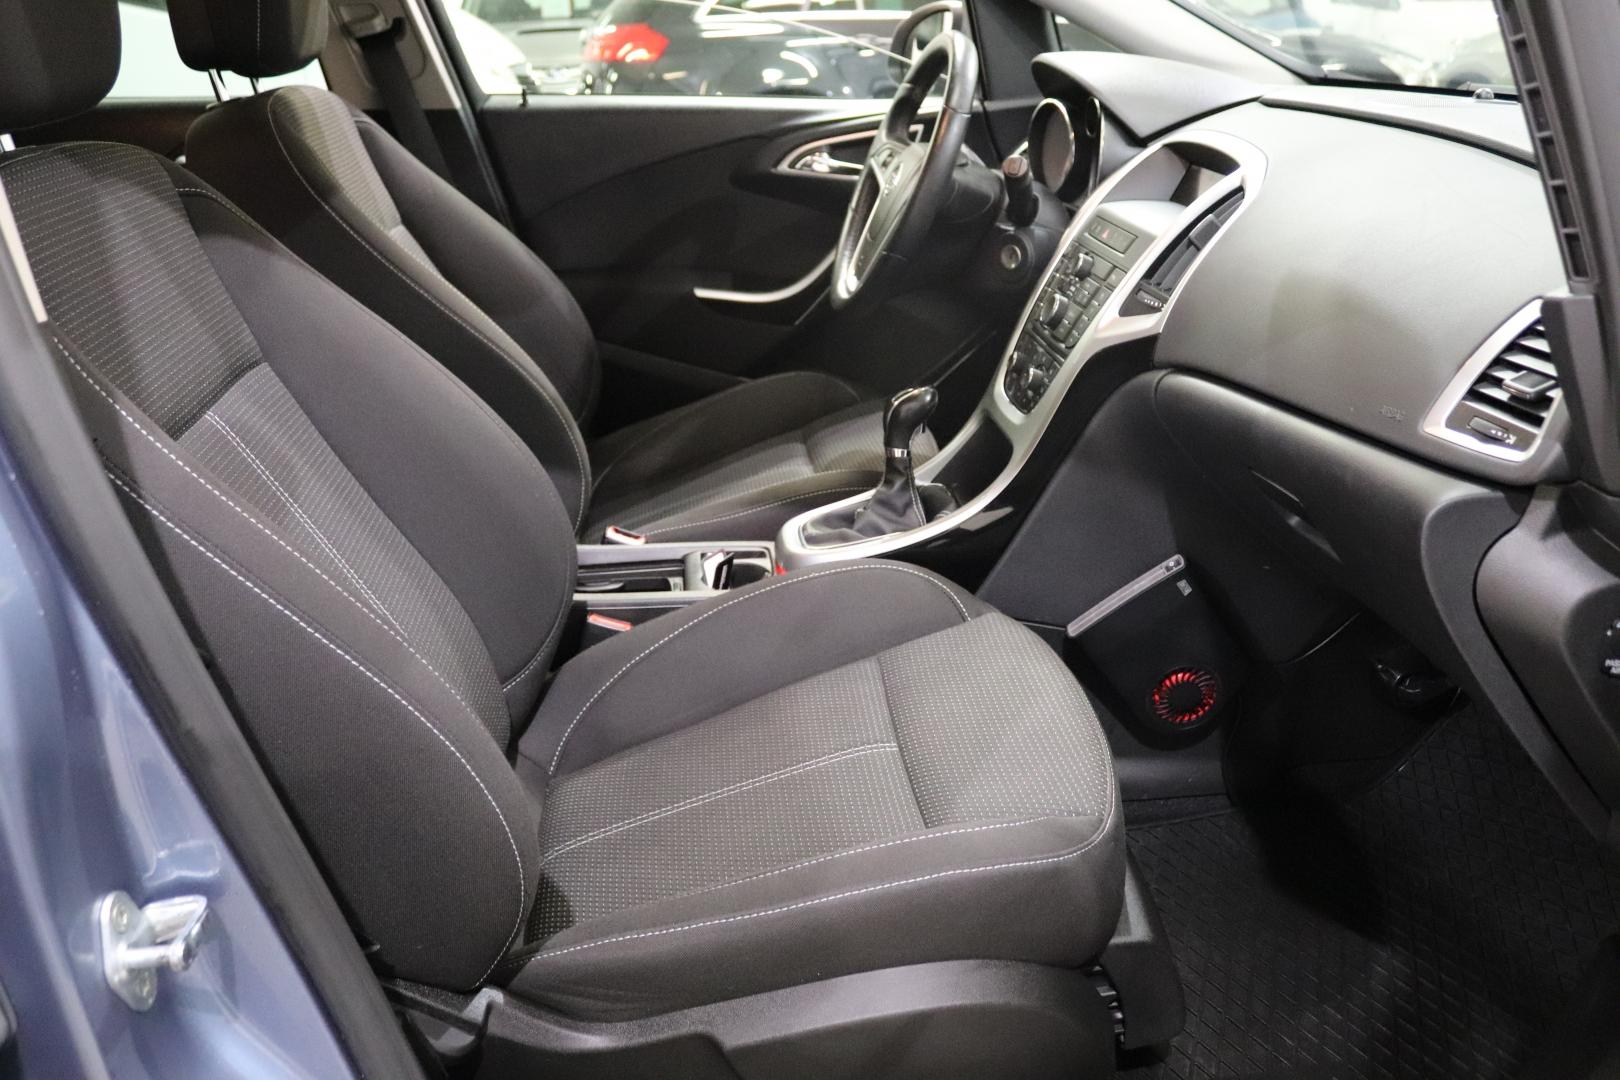 Opel Astra, Sport Tourer Sport 1,4 Turbo 103kw